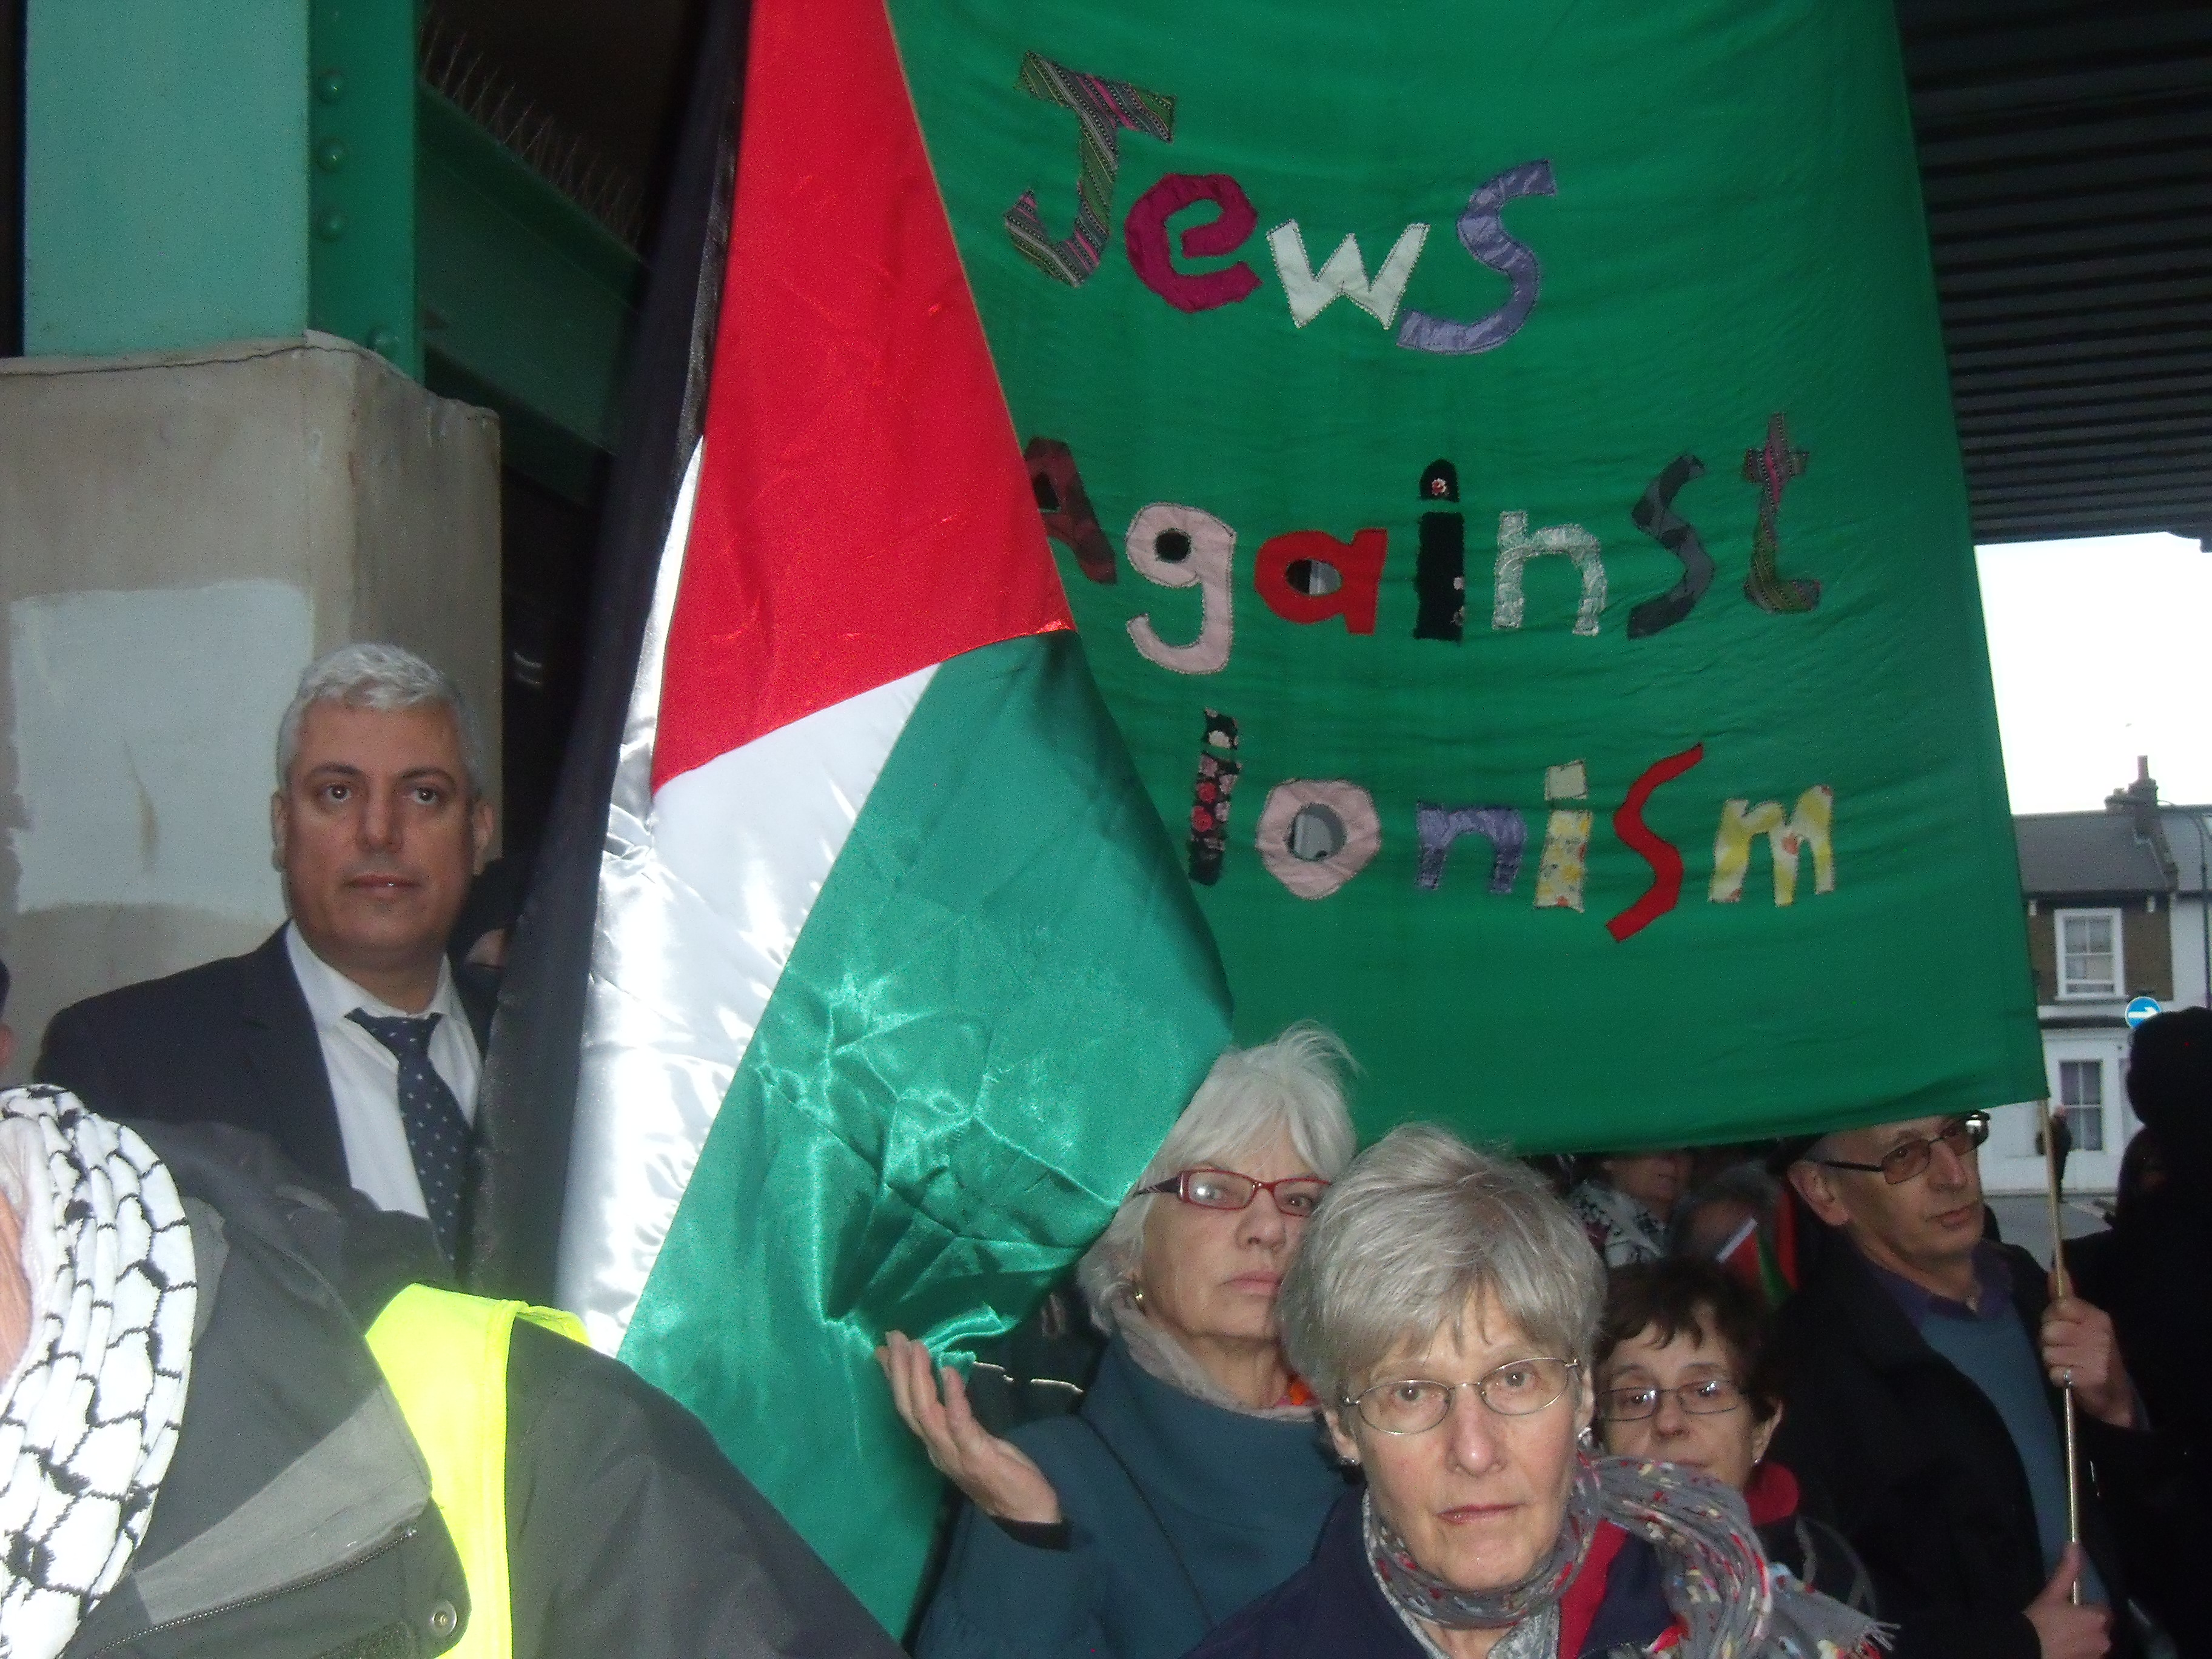 A few rebellious Jews as ever.